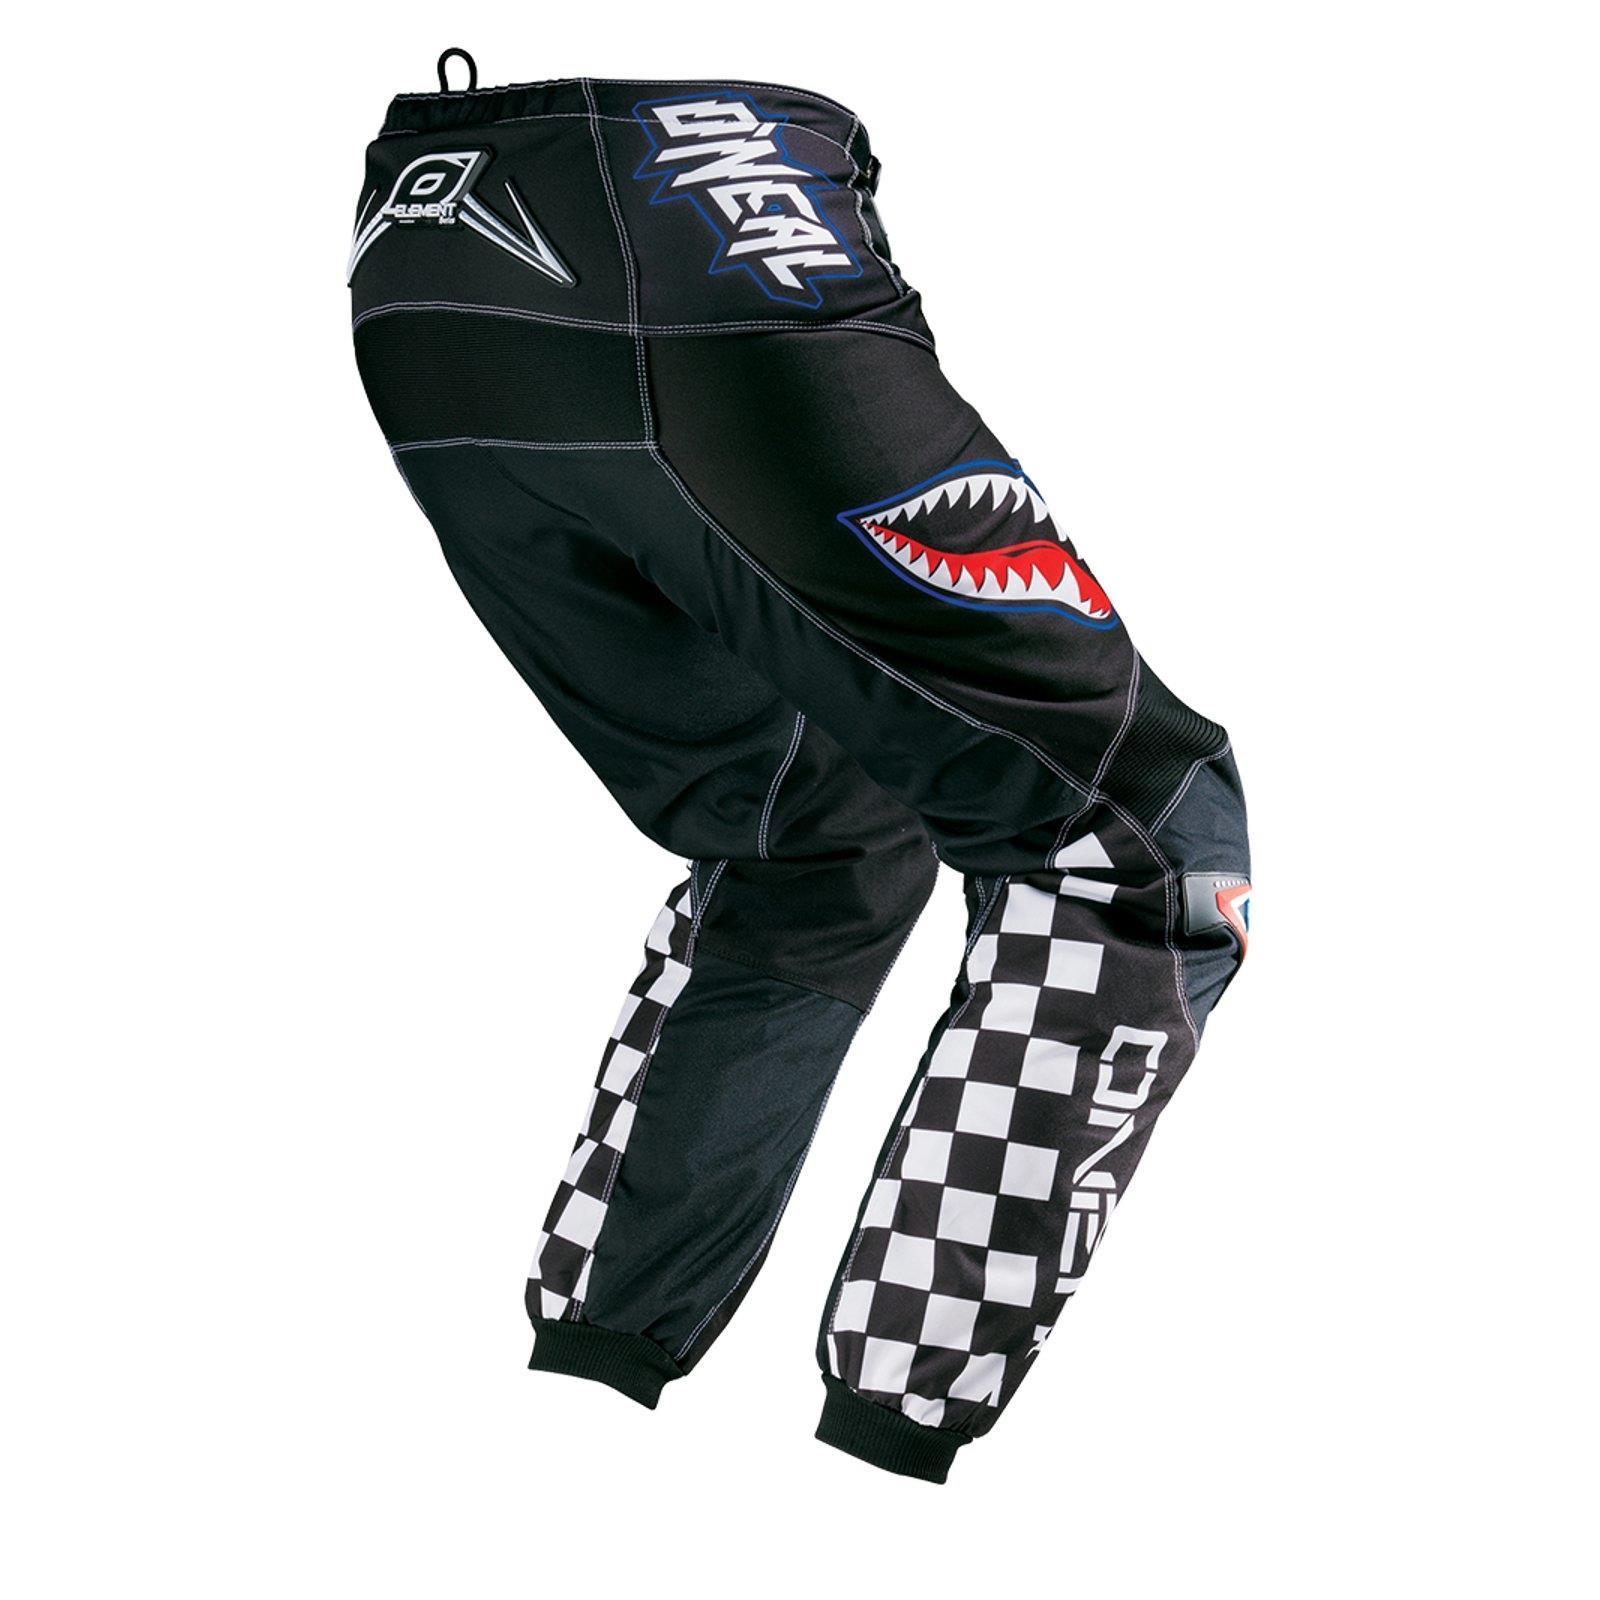 ONeal-pantalones-de-Jersey-de-los-ninos-de-pantalones-cortos-ninos-MX-bicicleta-DH-montana-bicicleta miniatura 48